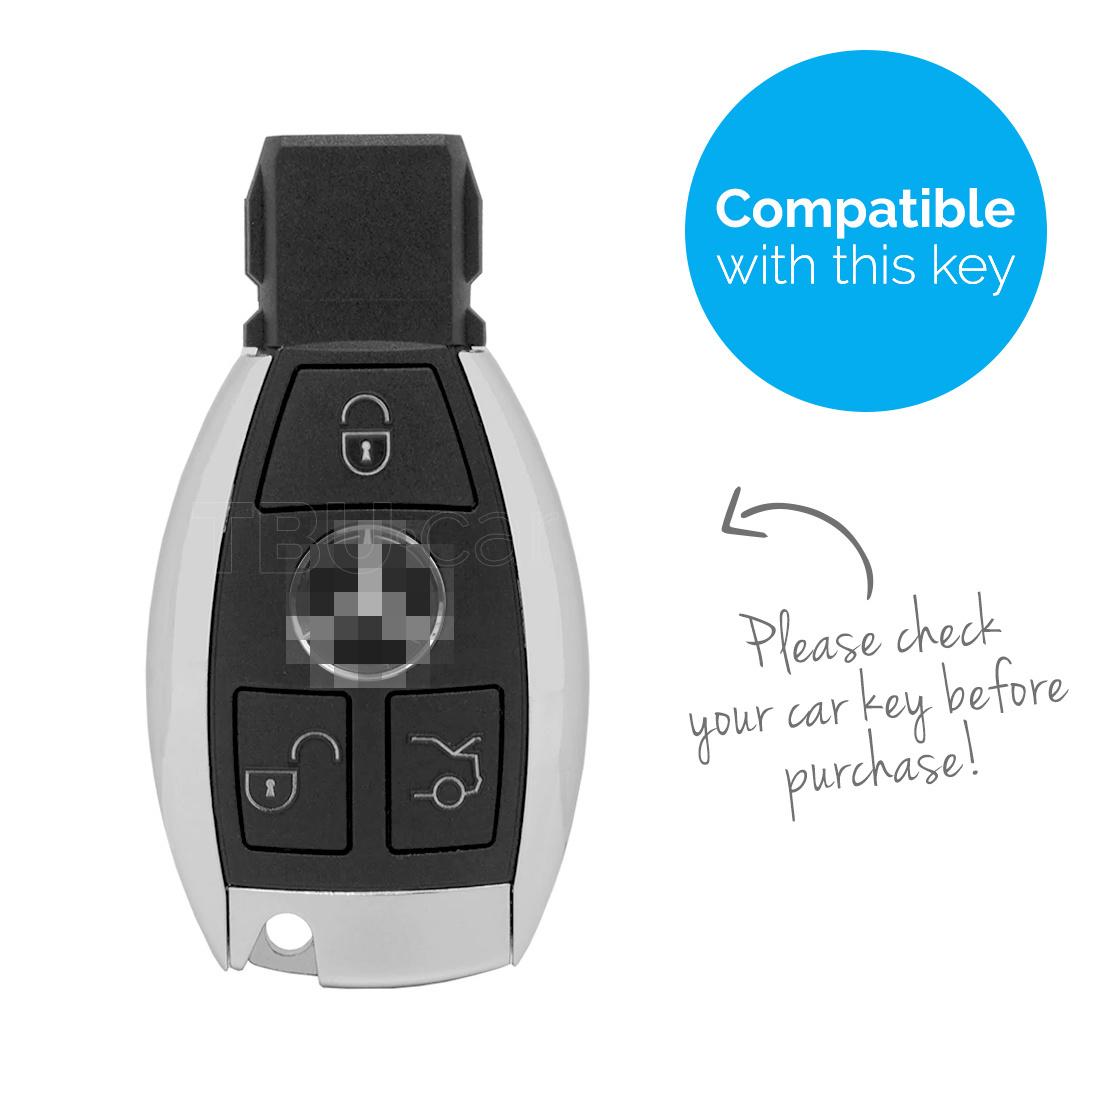 TBU car TBU car Autoschlüssel Hülle kompatibel mit Mercedes 3 Tasten - Schutzhülle aus Silikon - Auto Schlüsselhülle Cover in Rosa